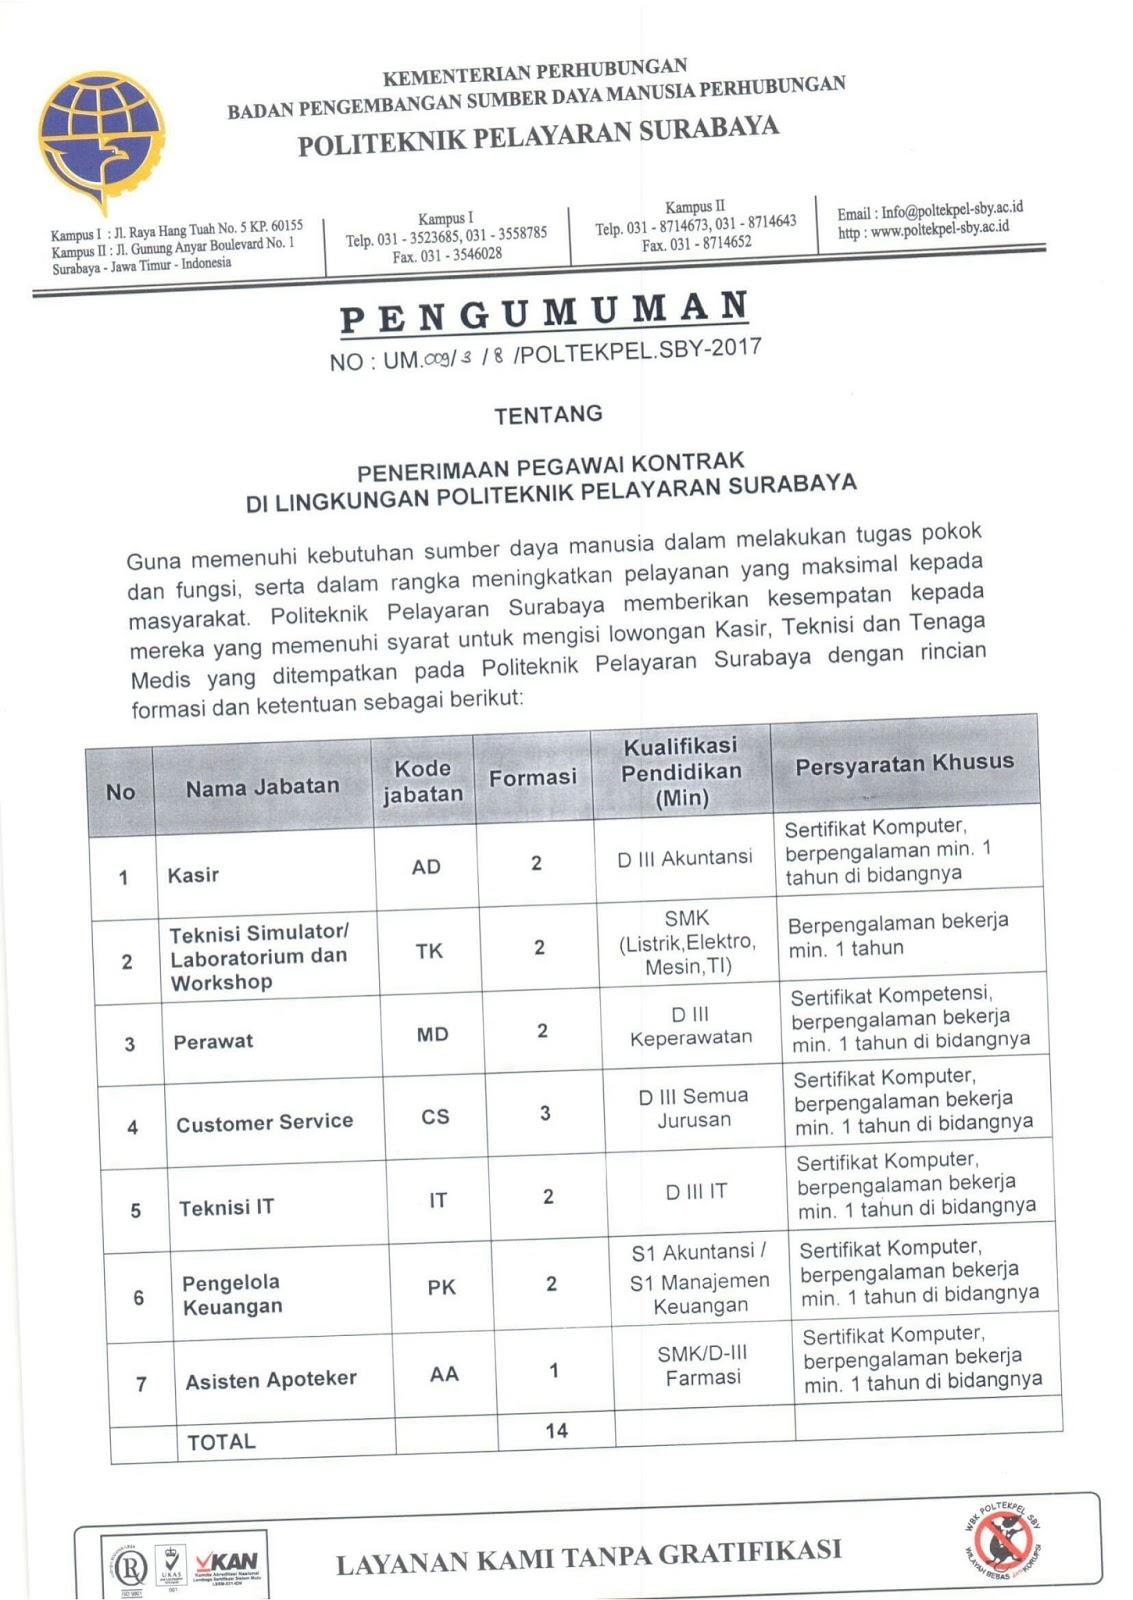 Lowongan Kerja   Kementerian Perhubungan [Politeknik Pelayaran Surabaya] Tingkat SMA SMK   Agustus 2018